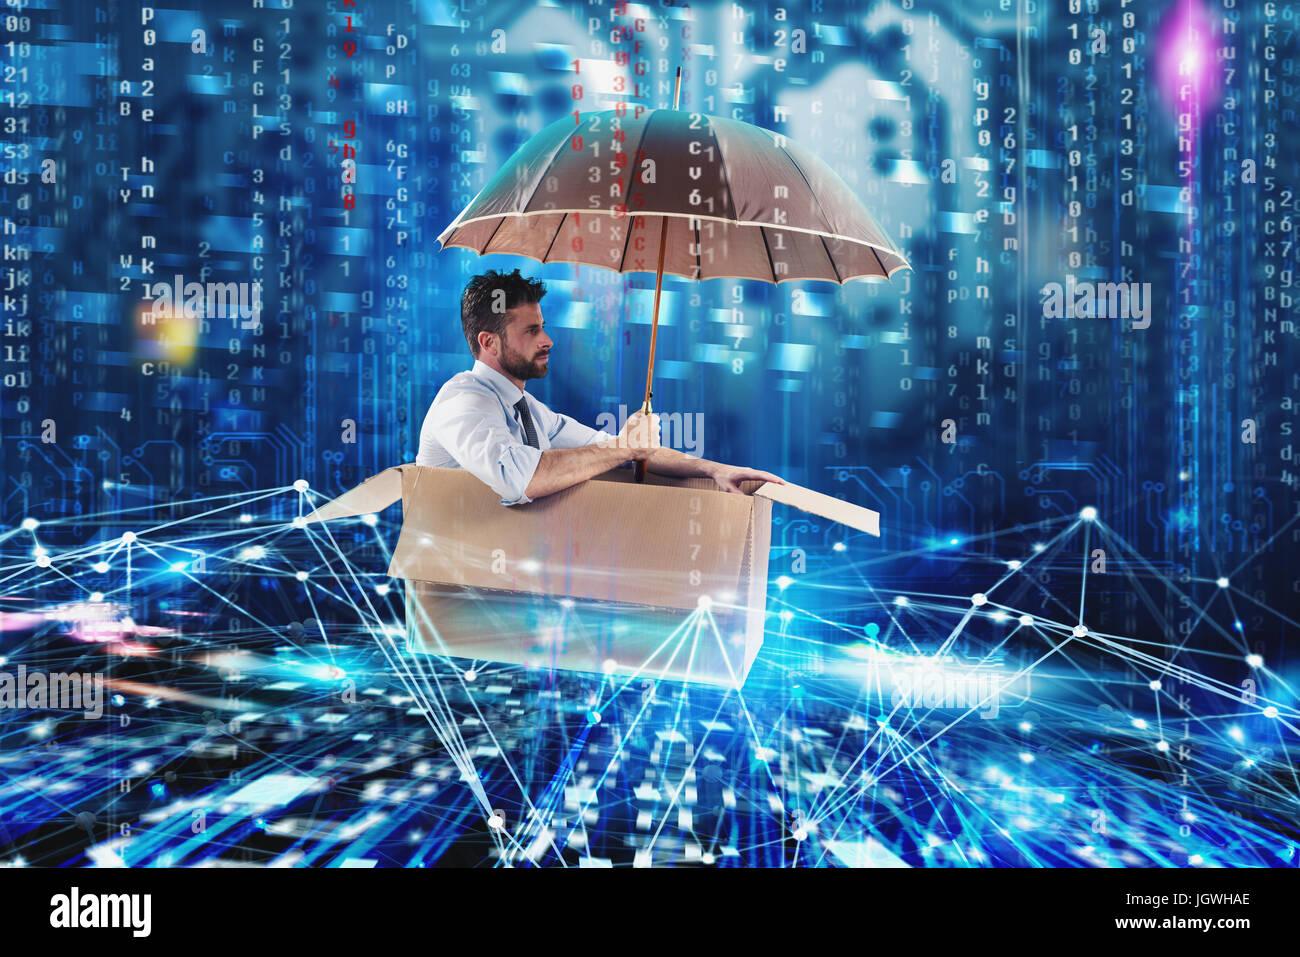 Empresario navegando por internet en un cartón. Concepto de exploración de Internet Imagen De Stock